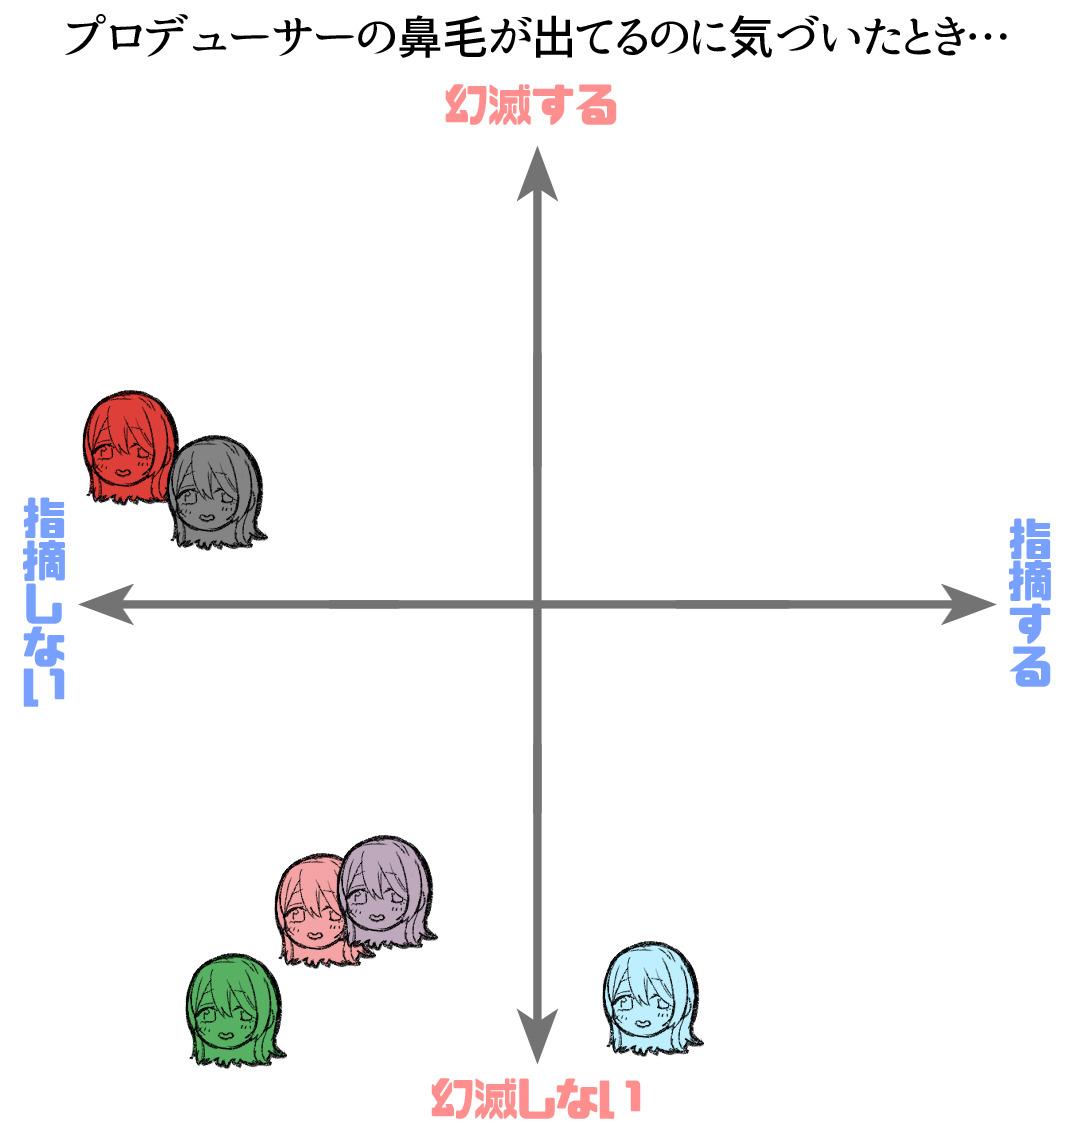 f:id:hoshi_sano:20200414113615j:image:w400